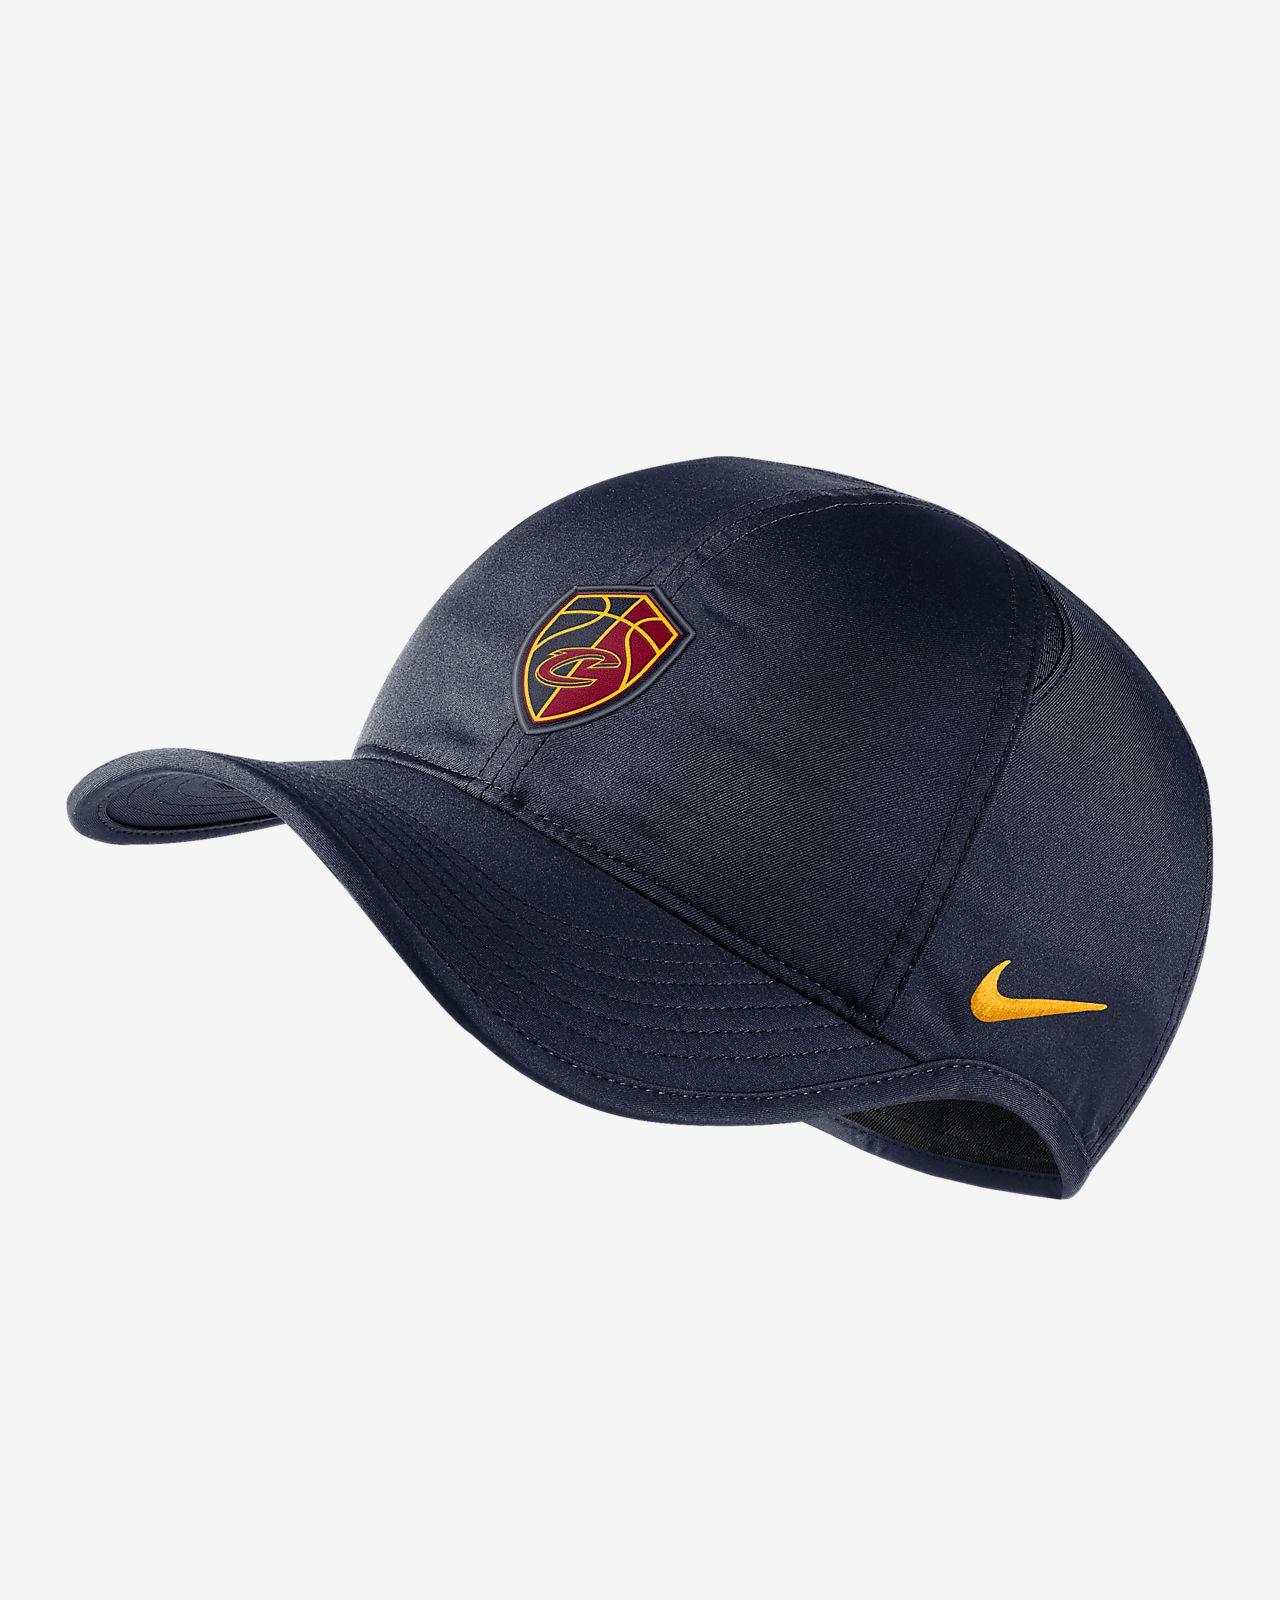 4d9986f79122d Cleveland Cavaliers Nike AeroBill Featherlight NBA Hat. Nike.com